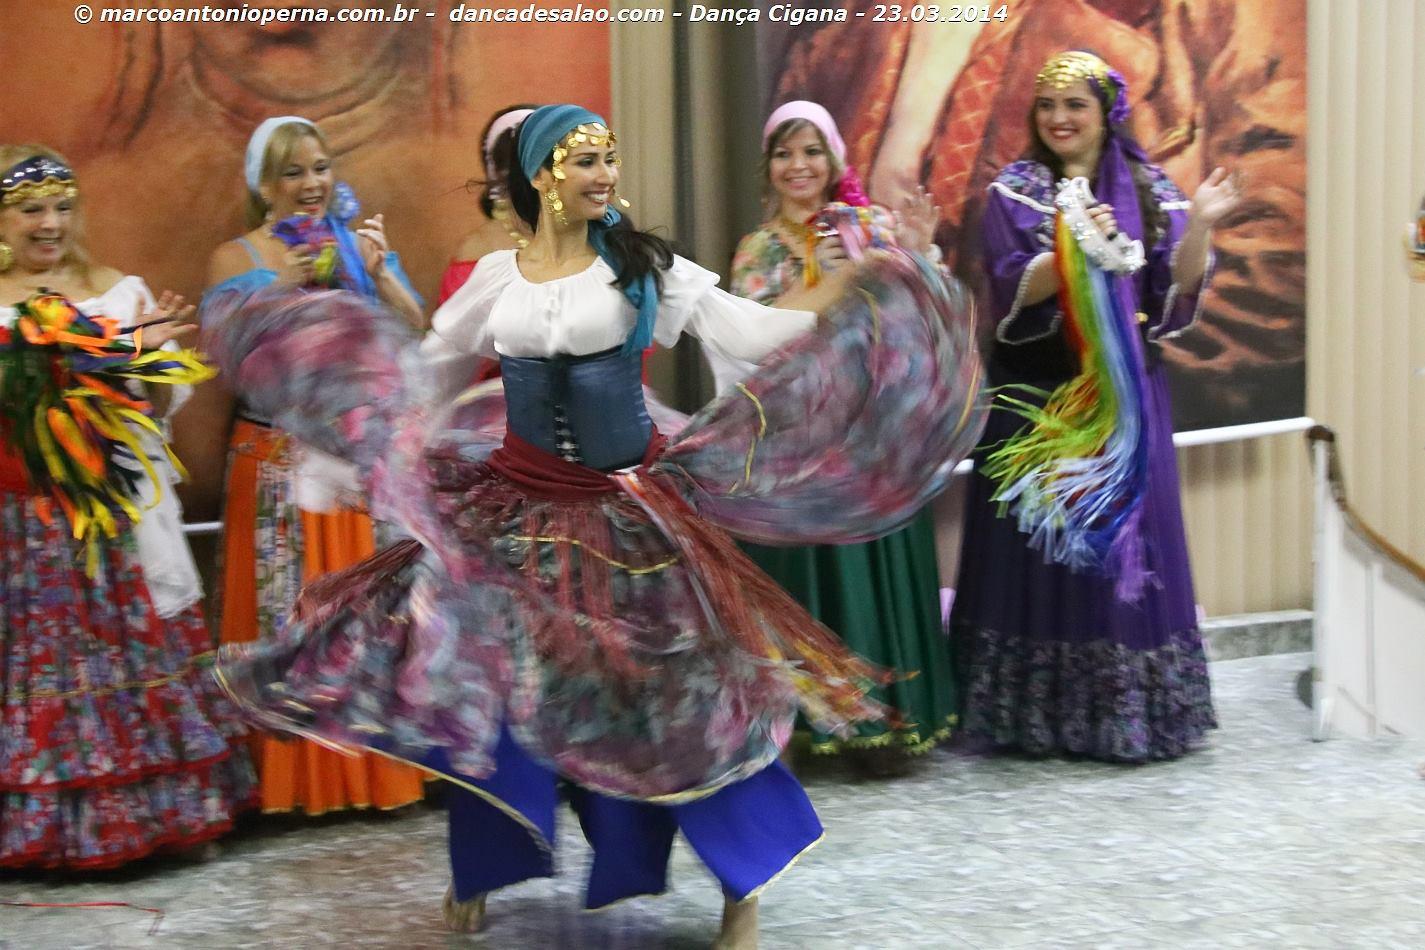 Dança Cigana 23.03.2014